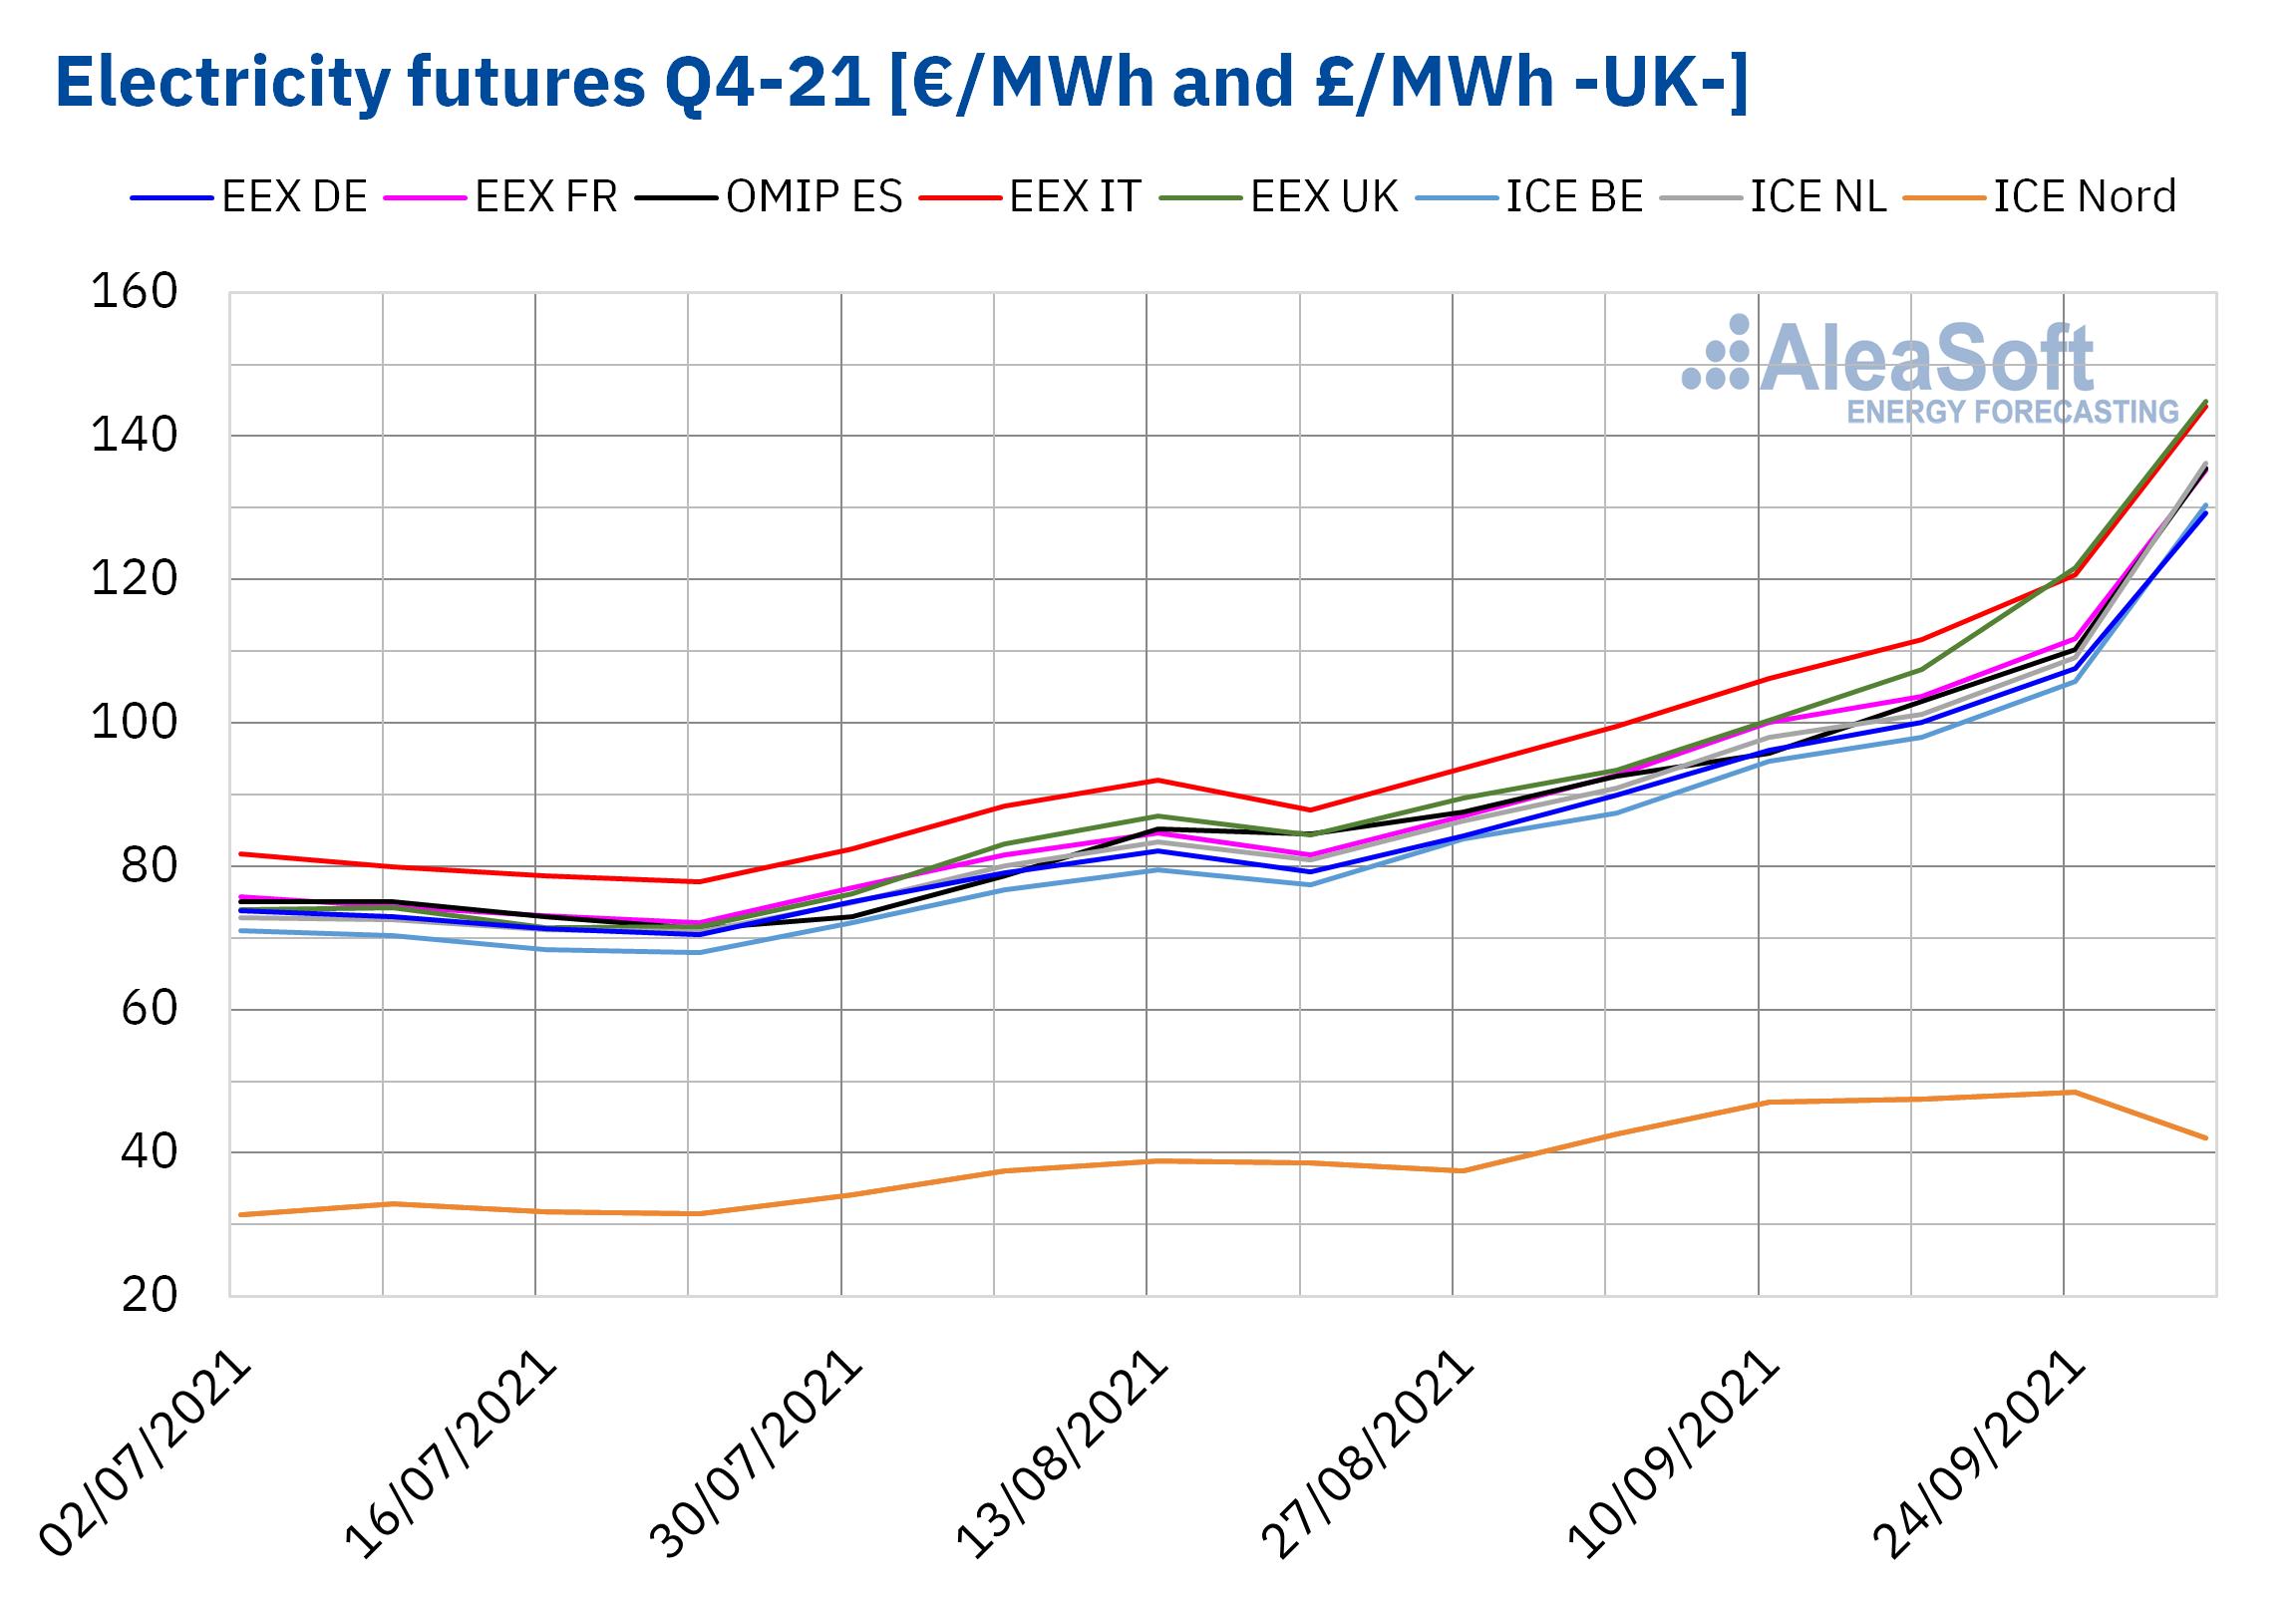 AleaSoft - electricity futures q4 21